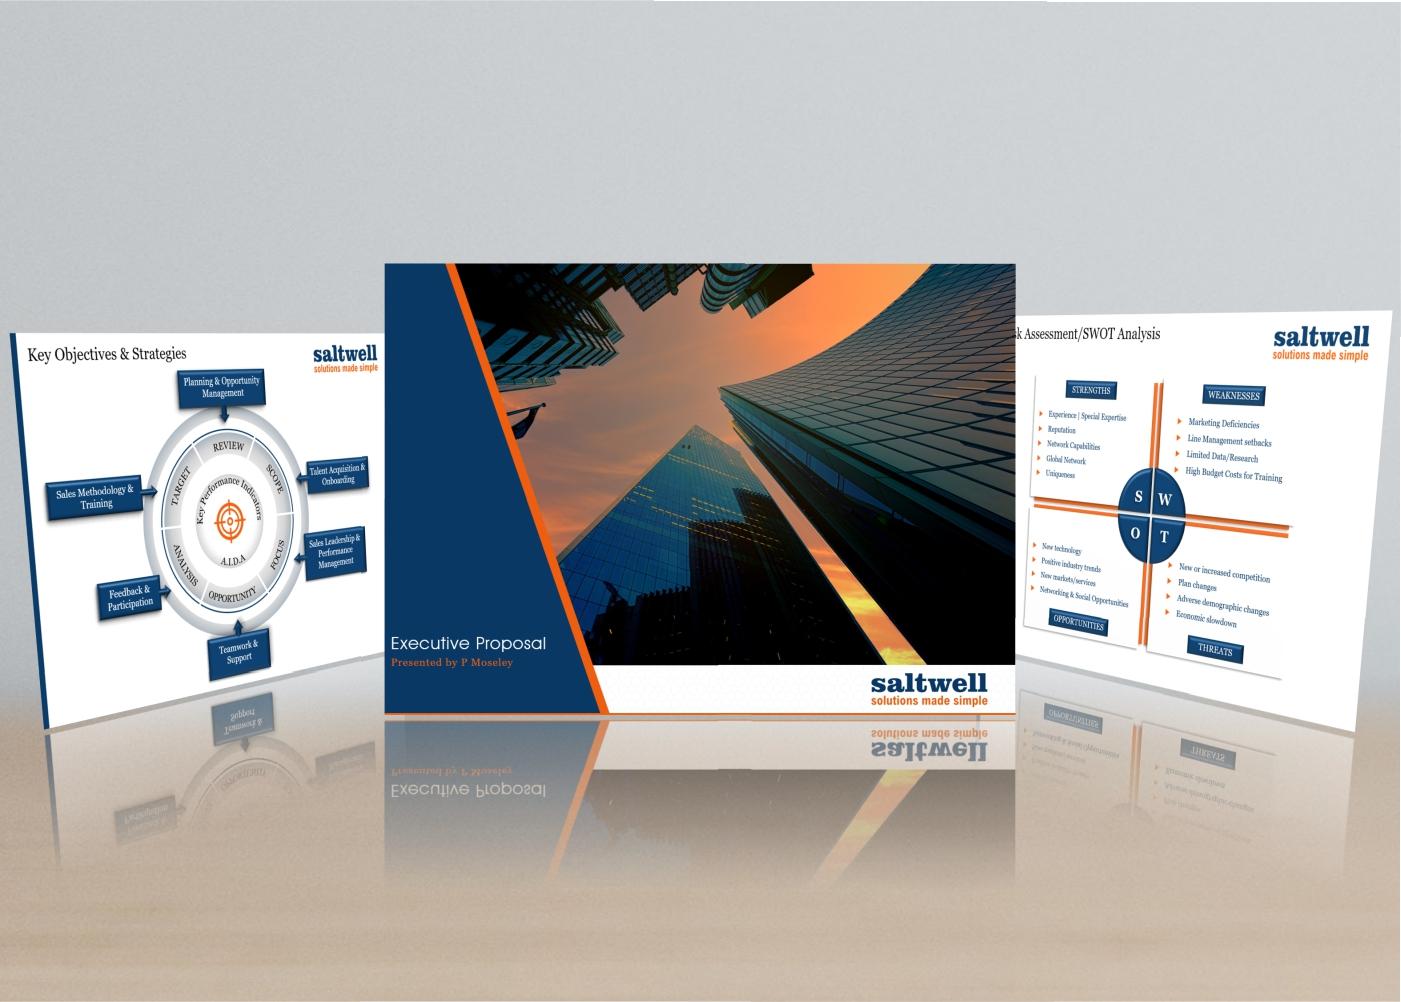 new-portfolio-page-image1